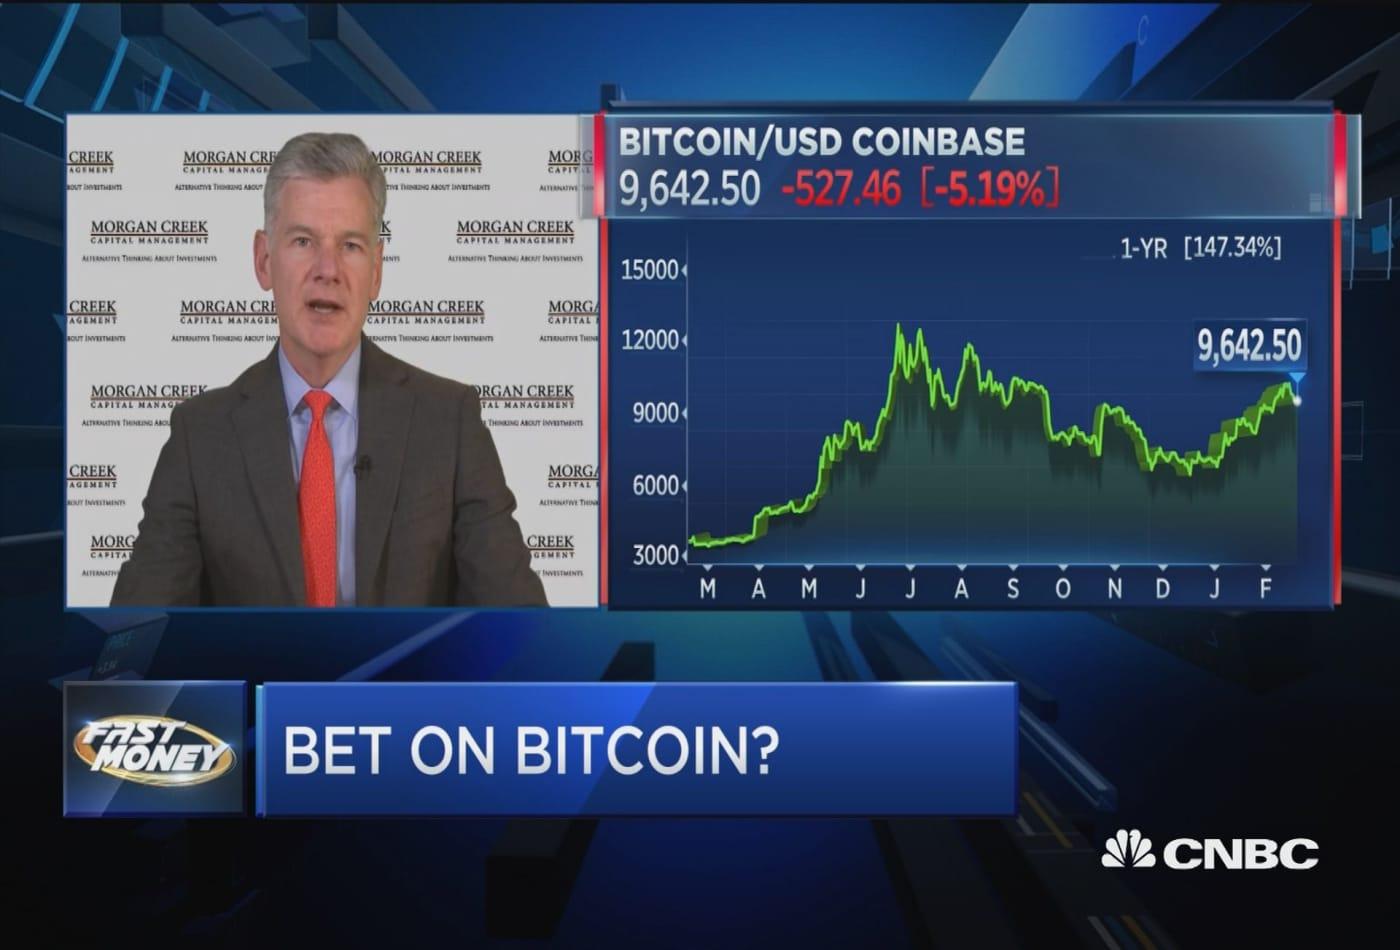 Morgan Creek Capital's Mark Yusko weighs in on bitcoin